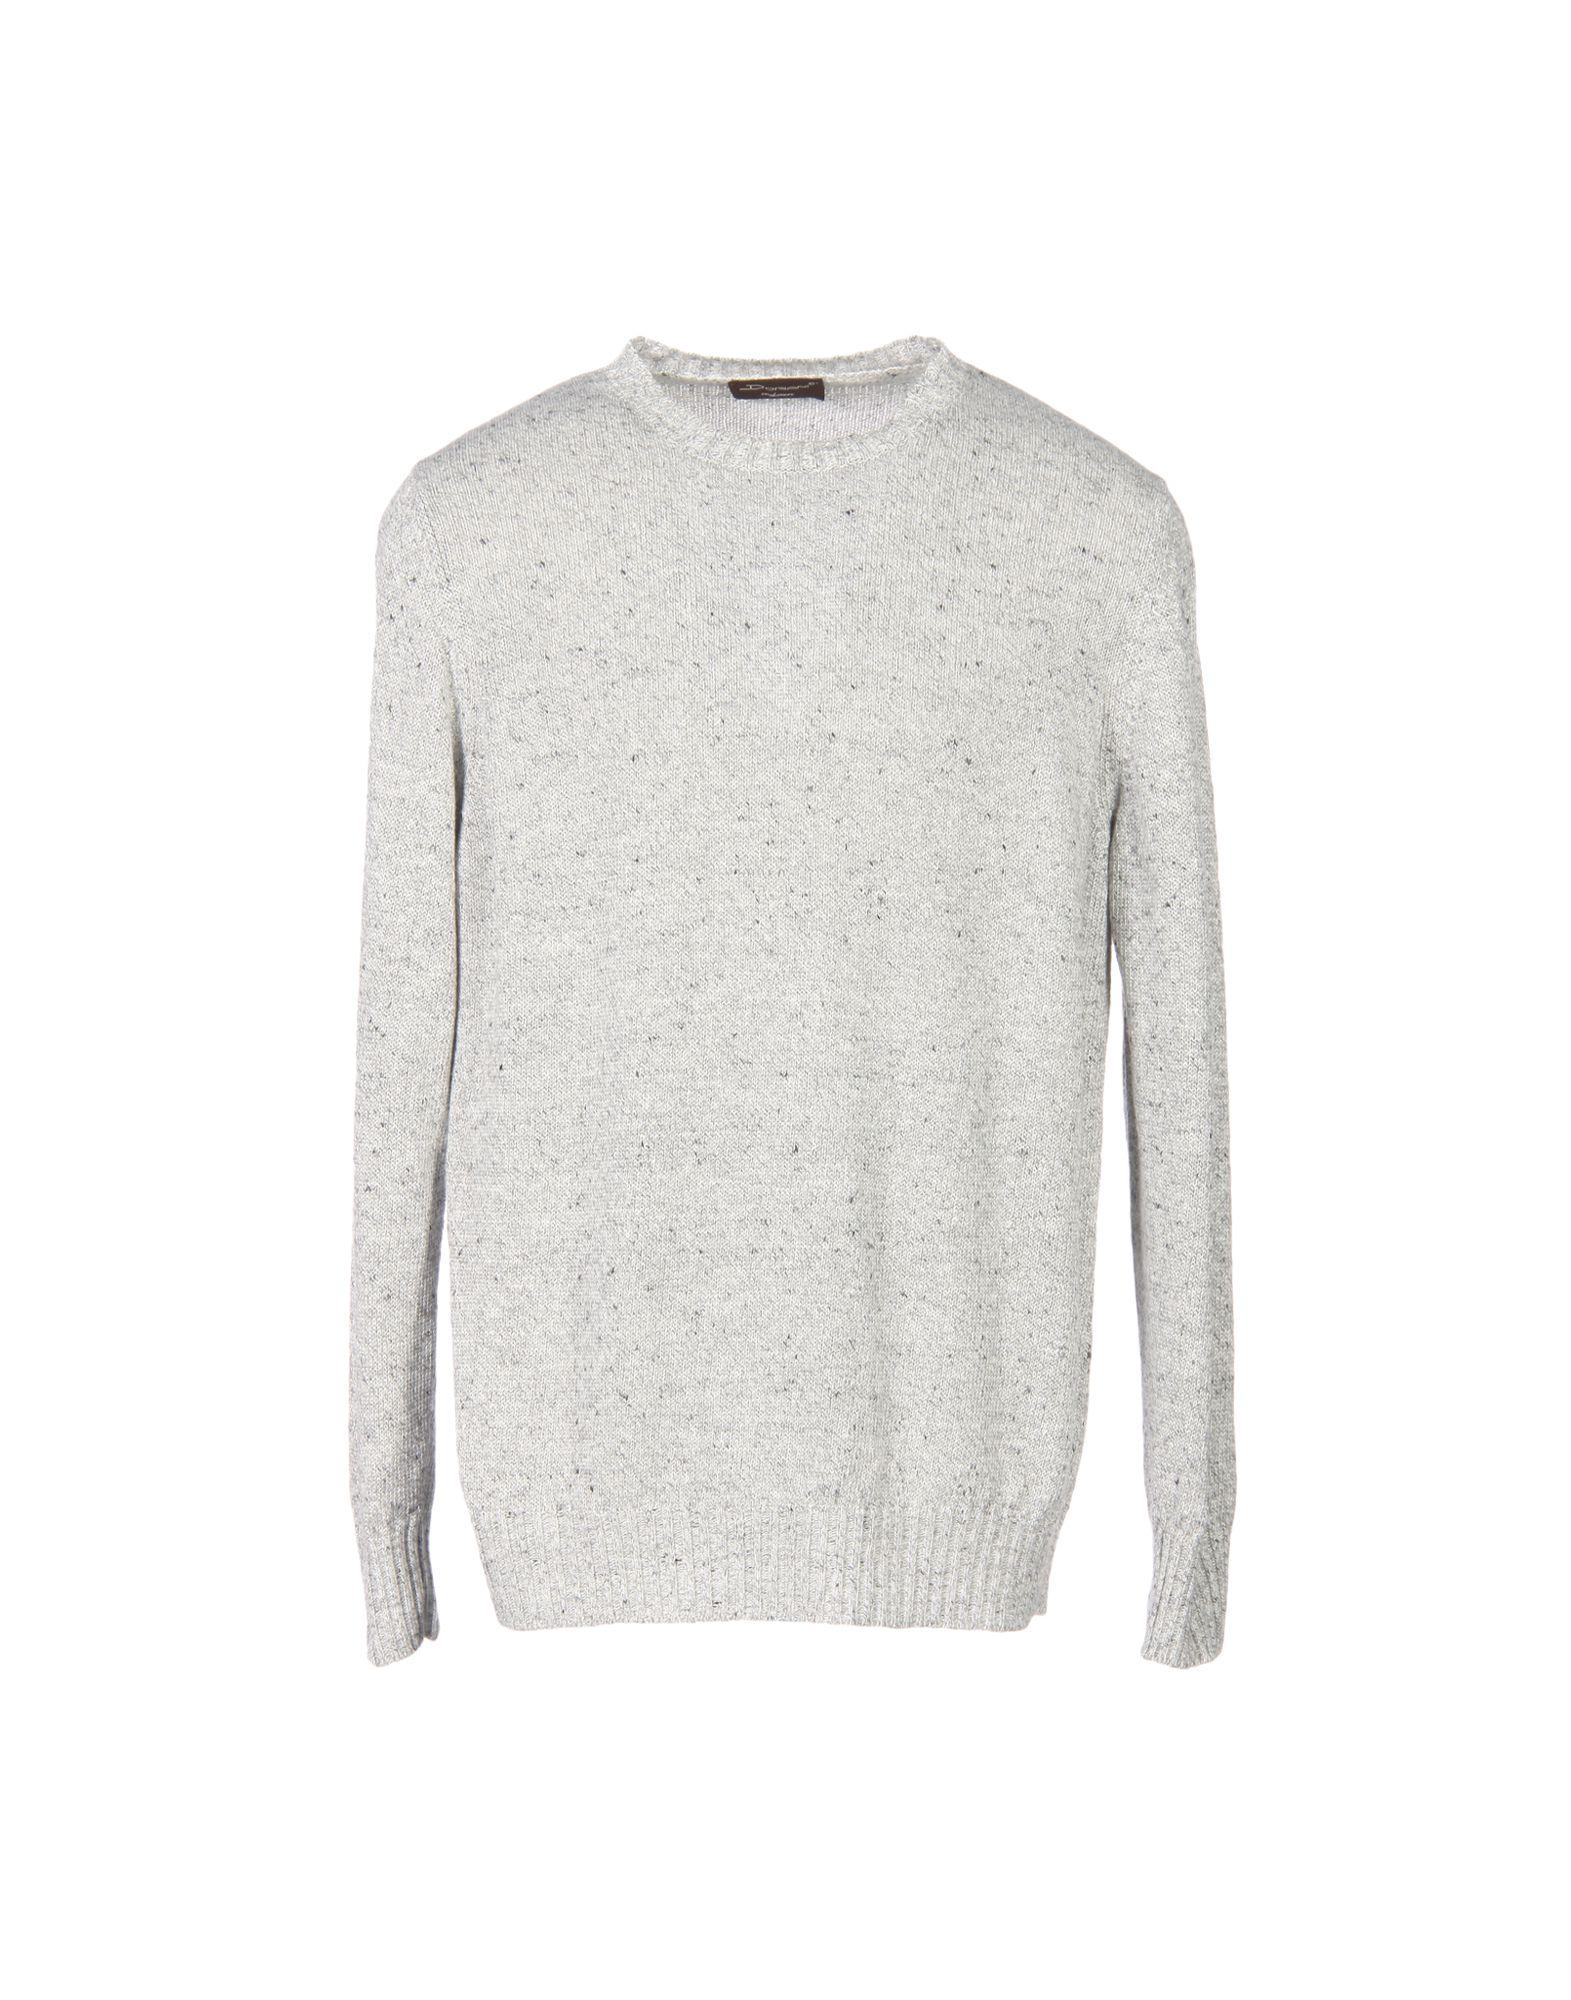 DORIANI Sweater in Light Grey